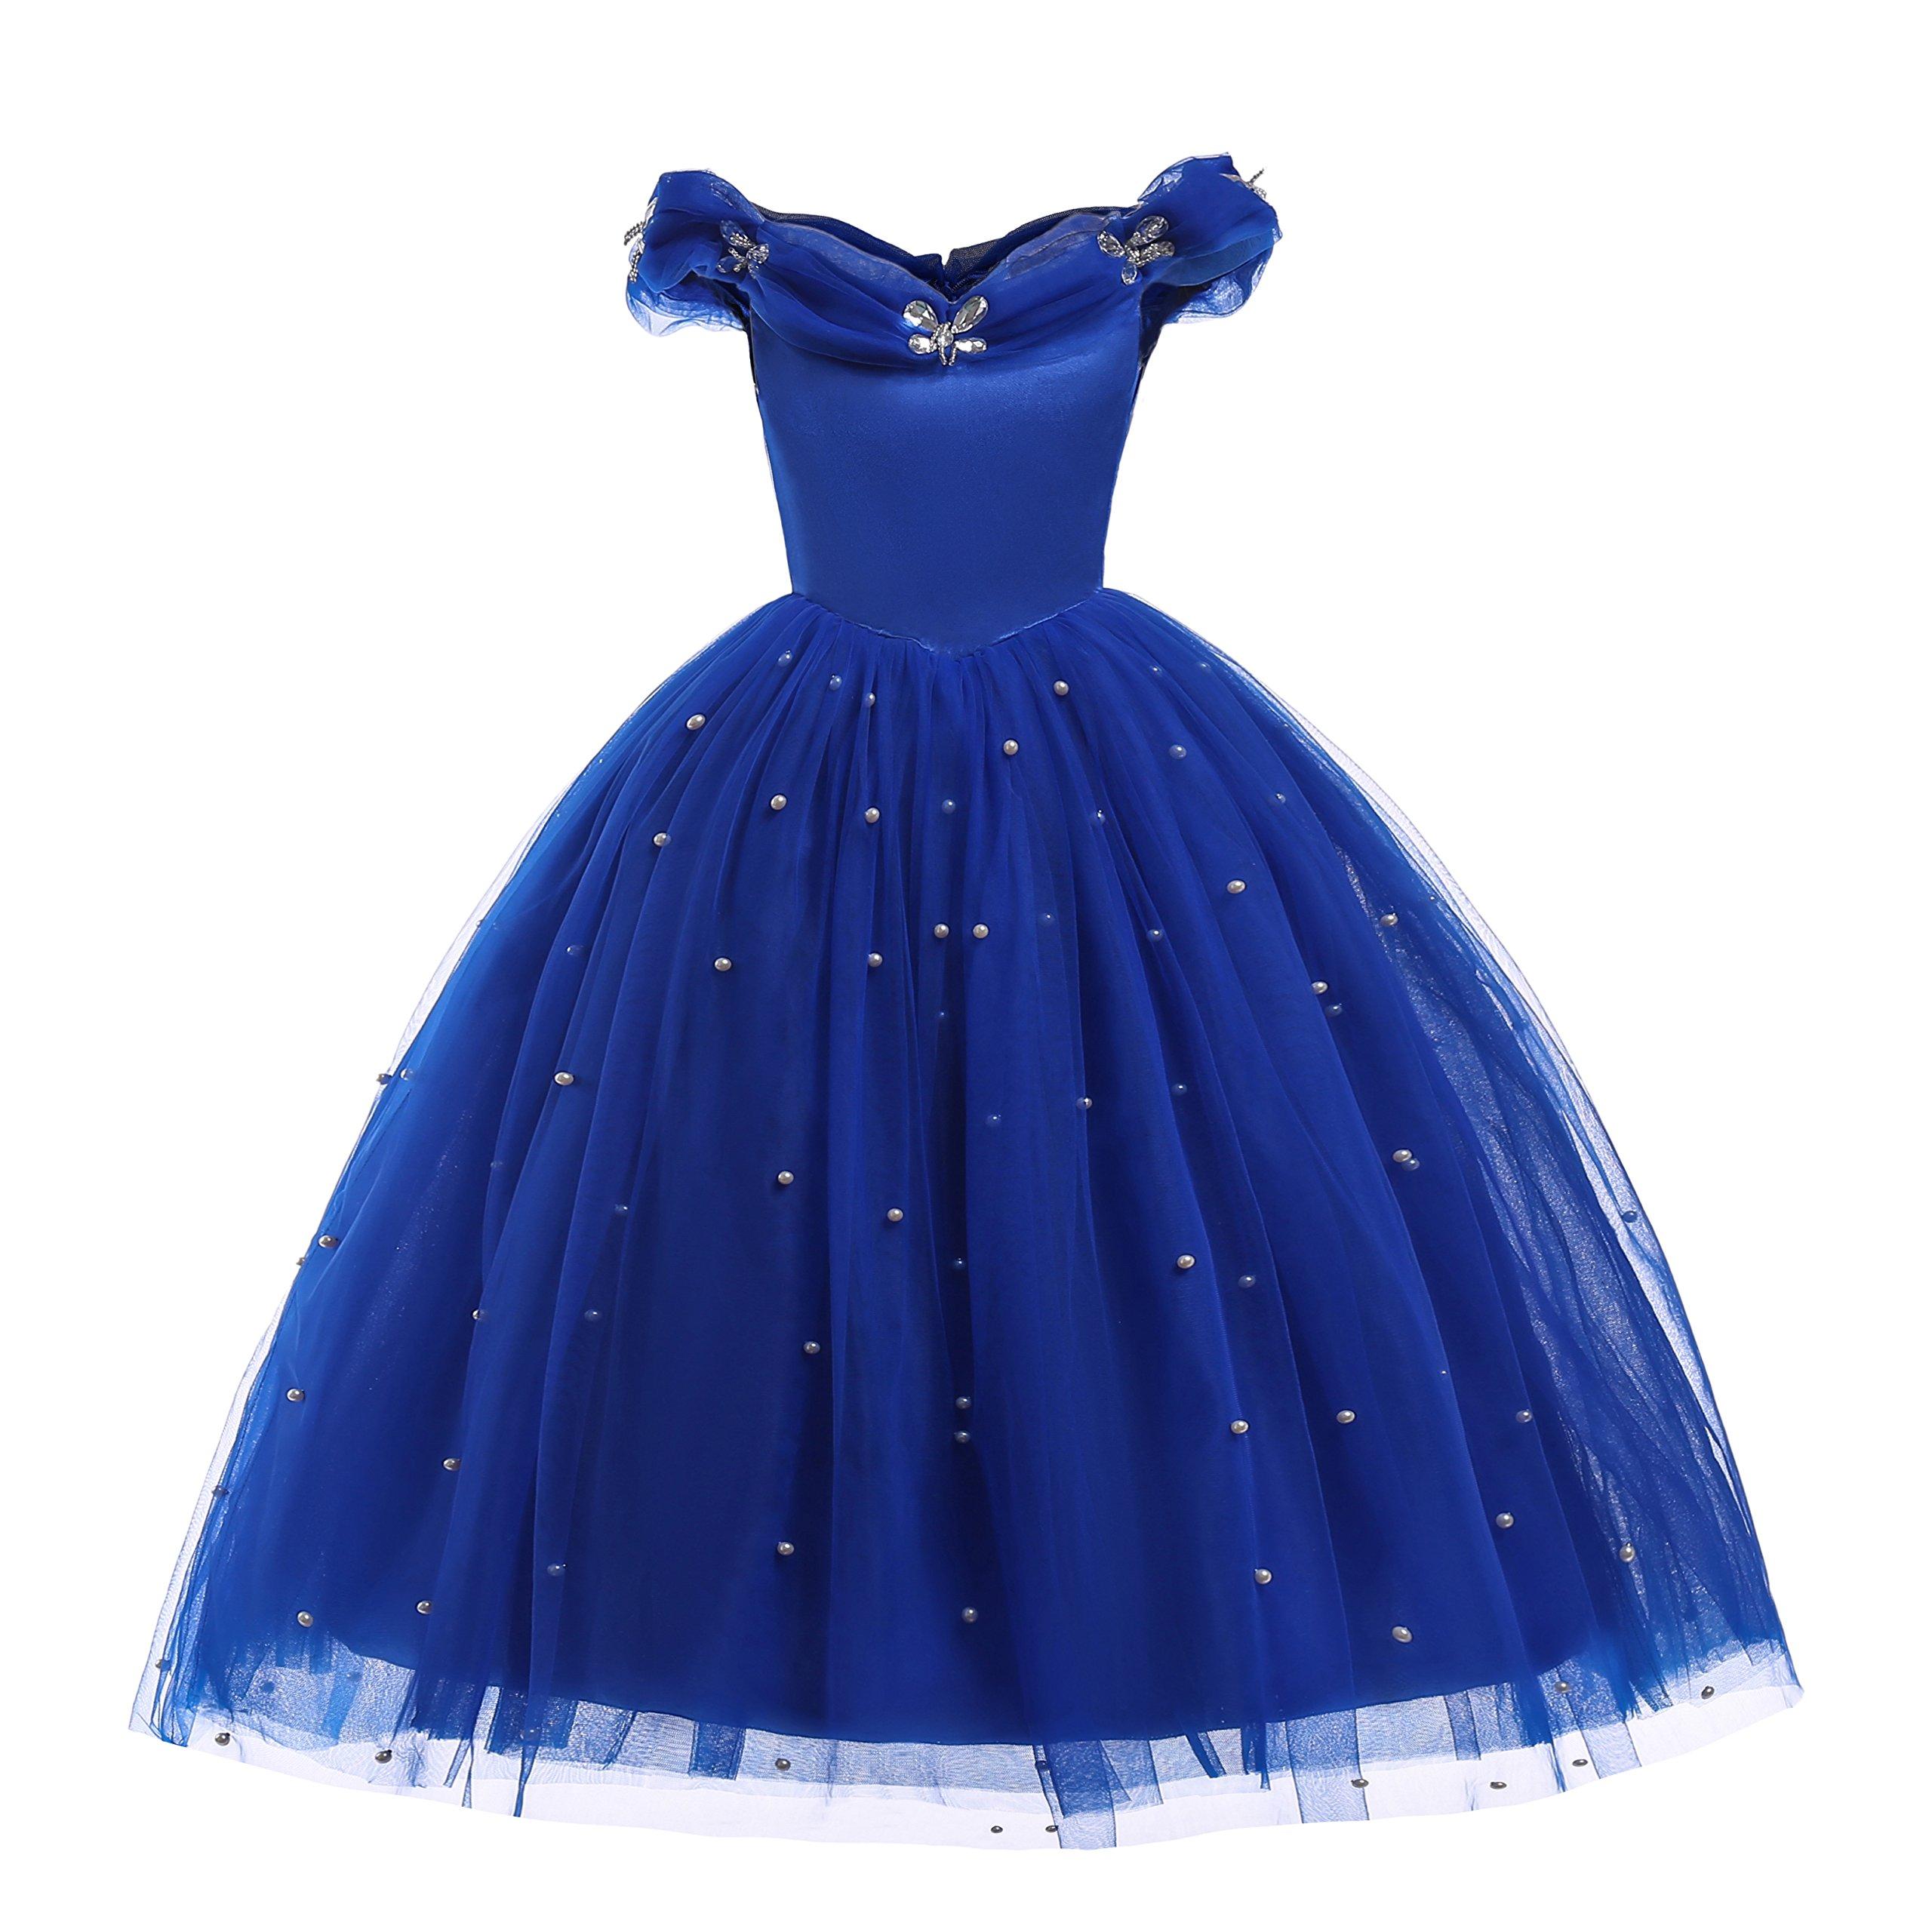 Dressy Daisy Girls Princess Cinderella Dress Costumes Flower Girls Dress Pageant Dresses Size 5/6